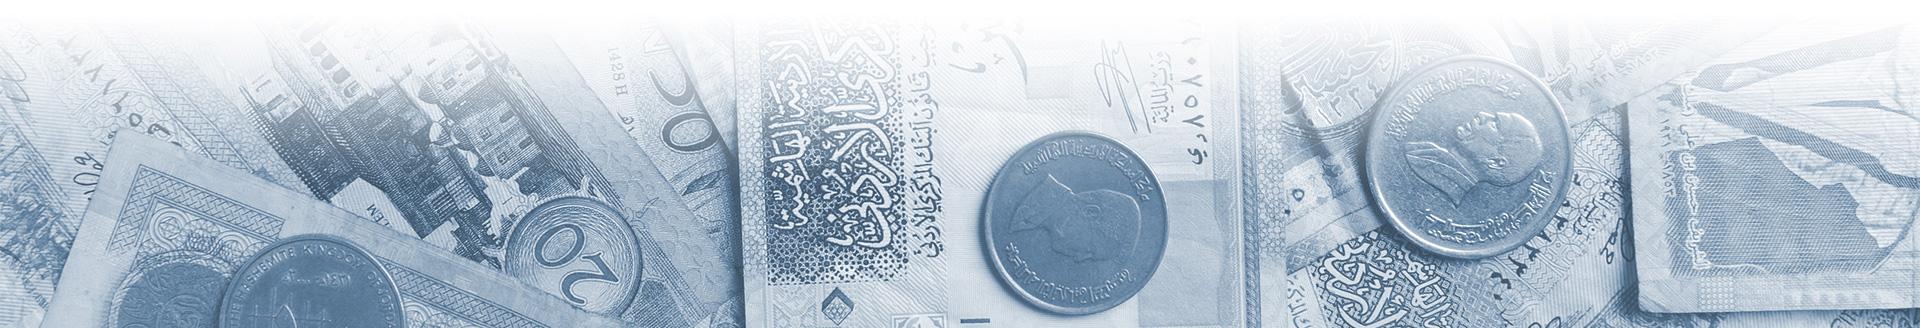 Linde v. Arab Bank, Plc - Payments from Hezbollah - Osen LLC